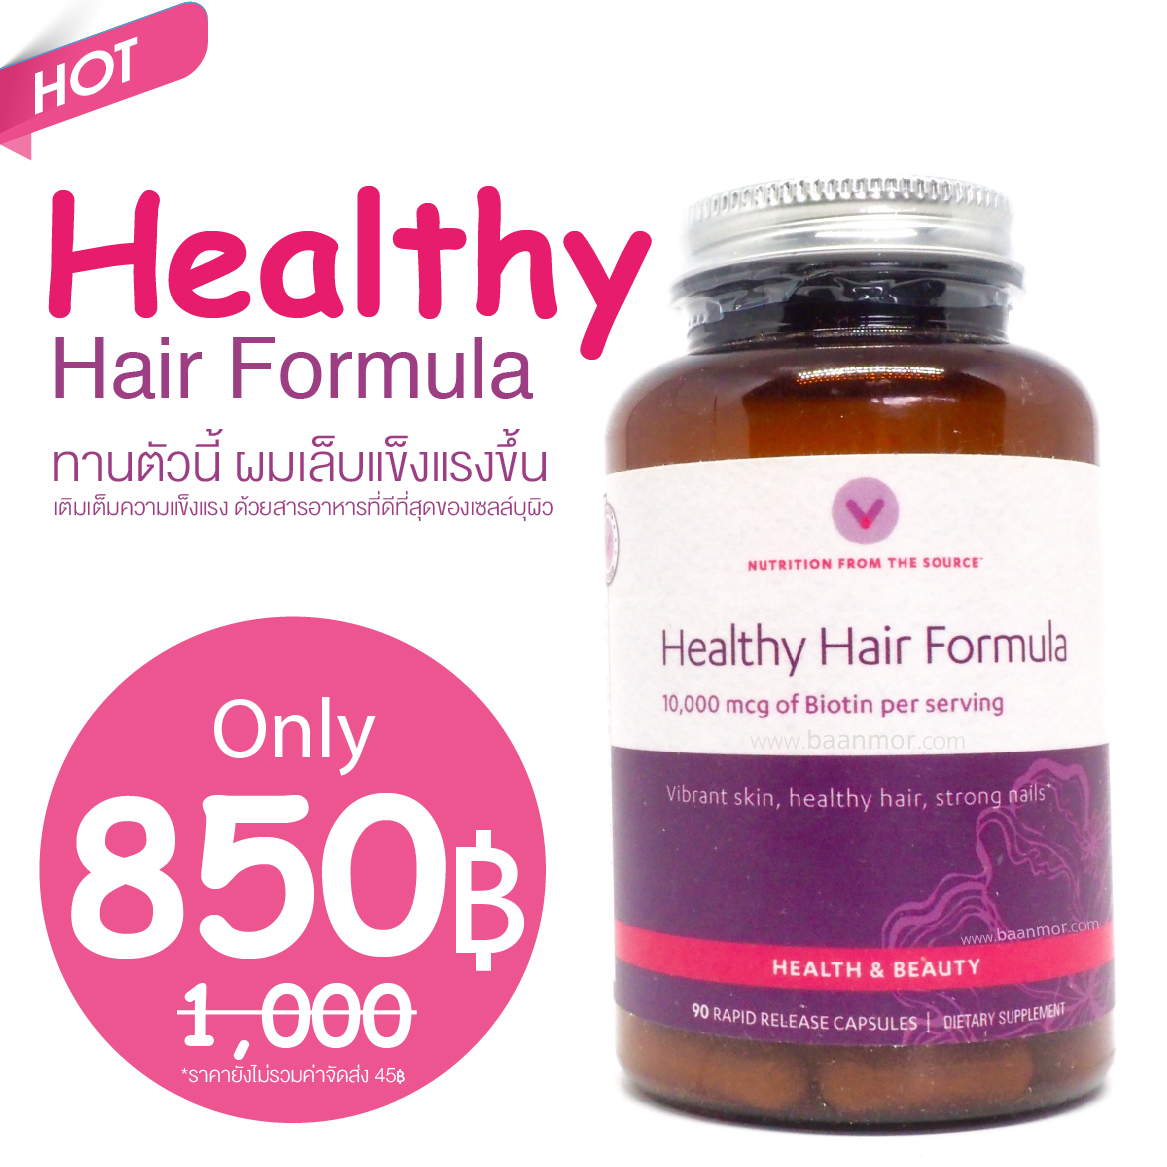 Healthy Hair Formula biotin 10,000mcg EXP 3/2018สารอาหารผม และเล็บ ไบโอติน 10,000 ไมโครกรัมหรือ 10 มก. ช่วยลดผมร่วง ผมหรือเล็บบางเปราะแตกหักง่าย ผมและเล็บแข็งแรงขึ้น 1 ขวดมี 90 เม็ด จาก Vitamin World